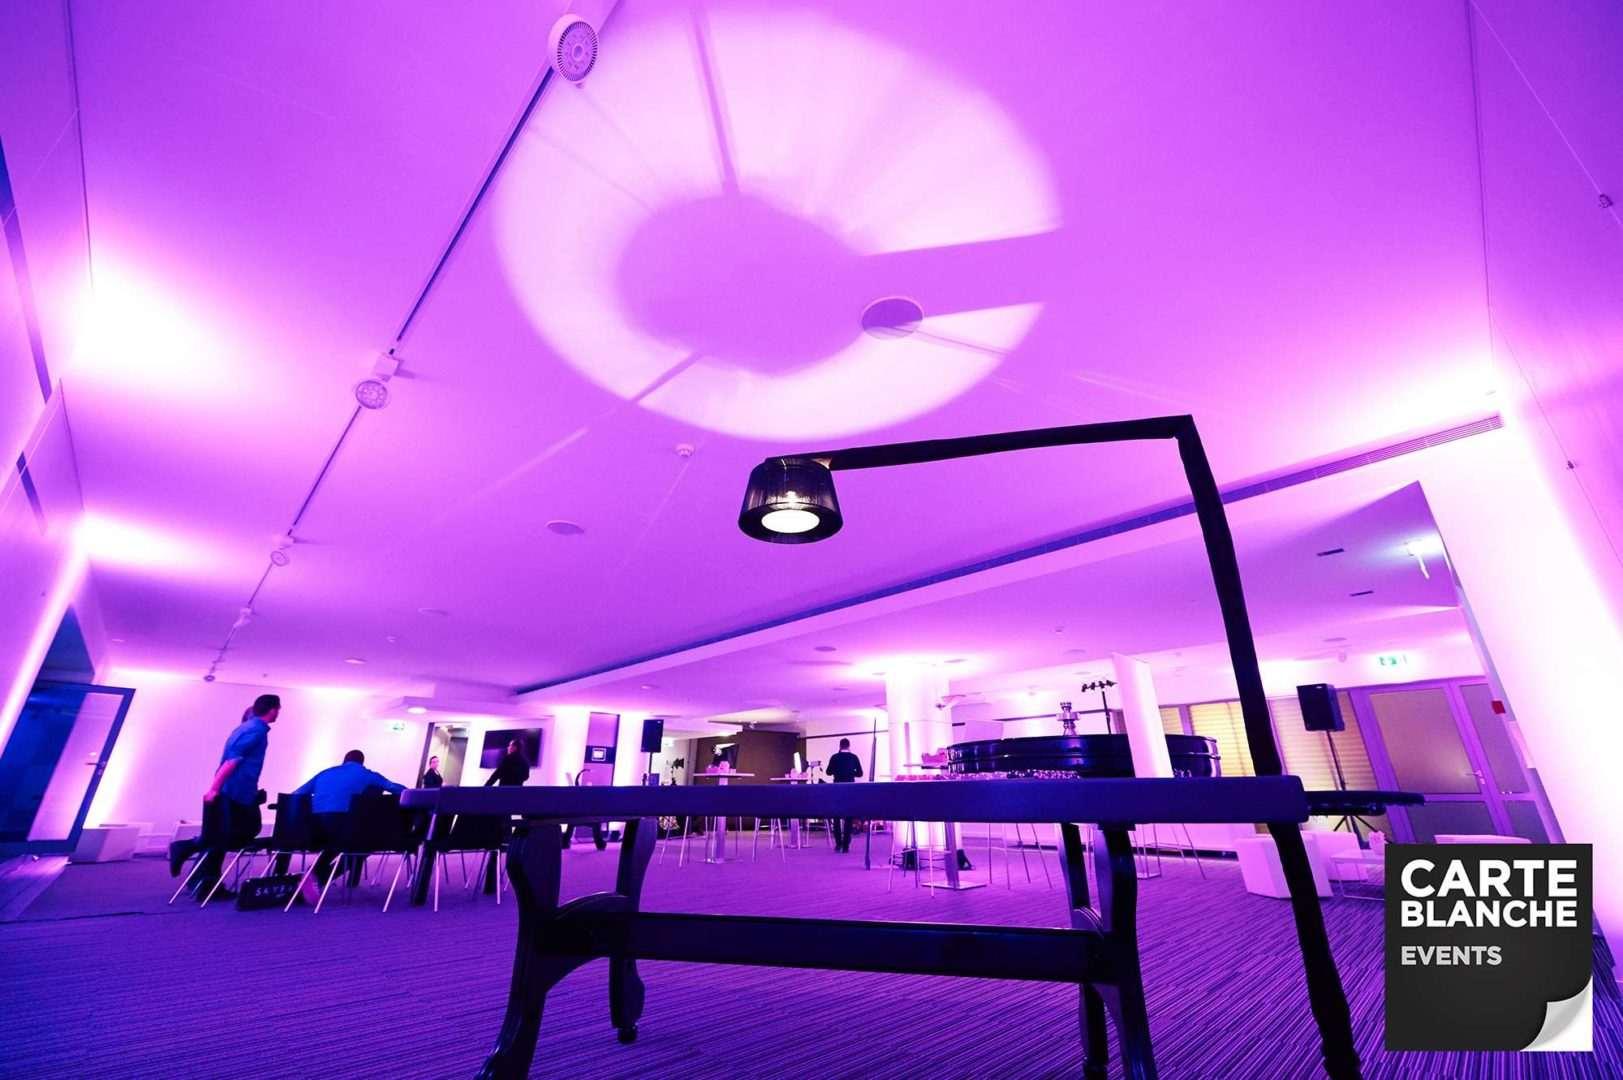 xmas-degroof-petercam-2015-023-luxembourg-event